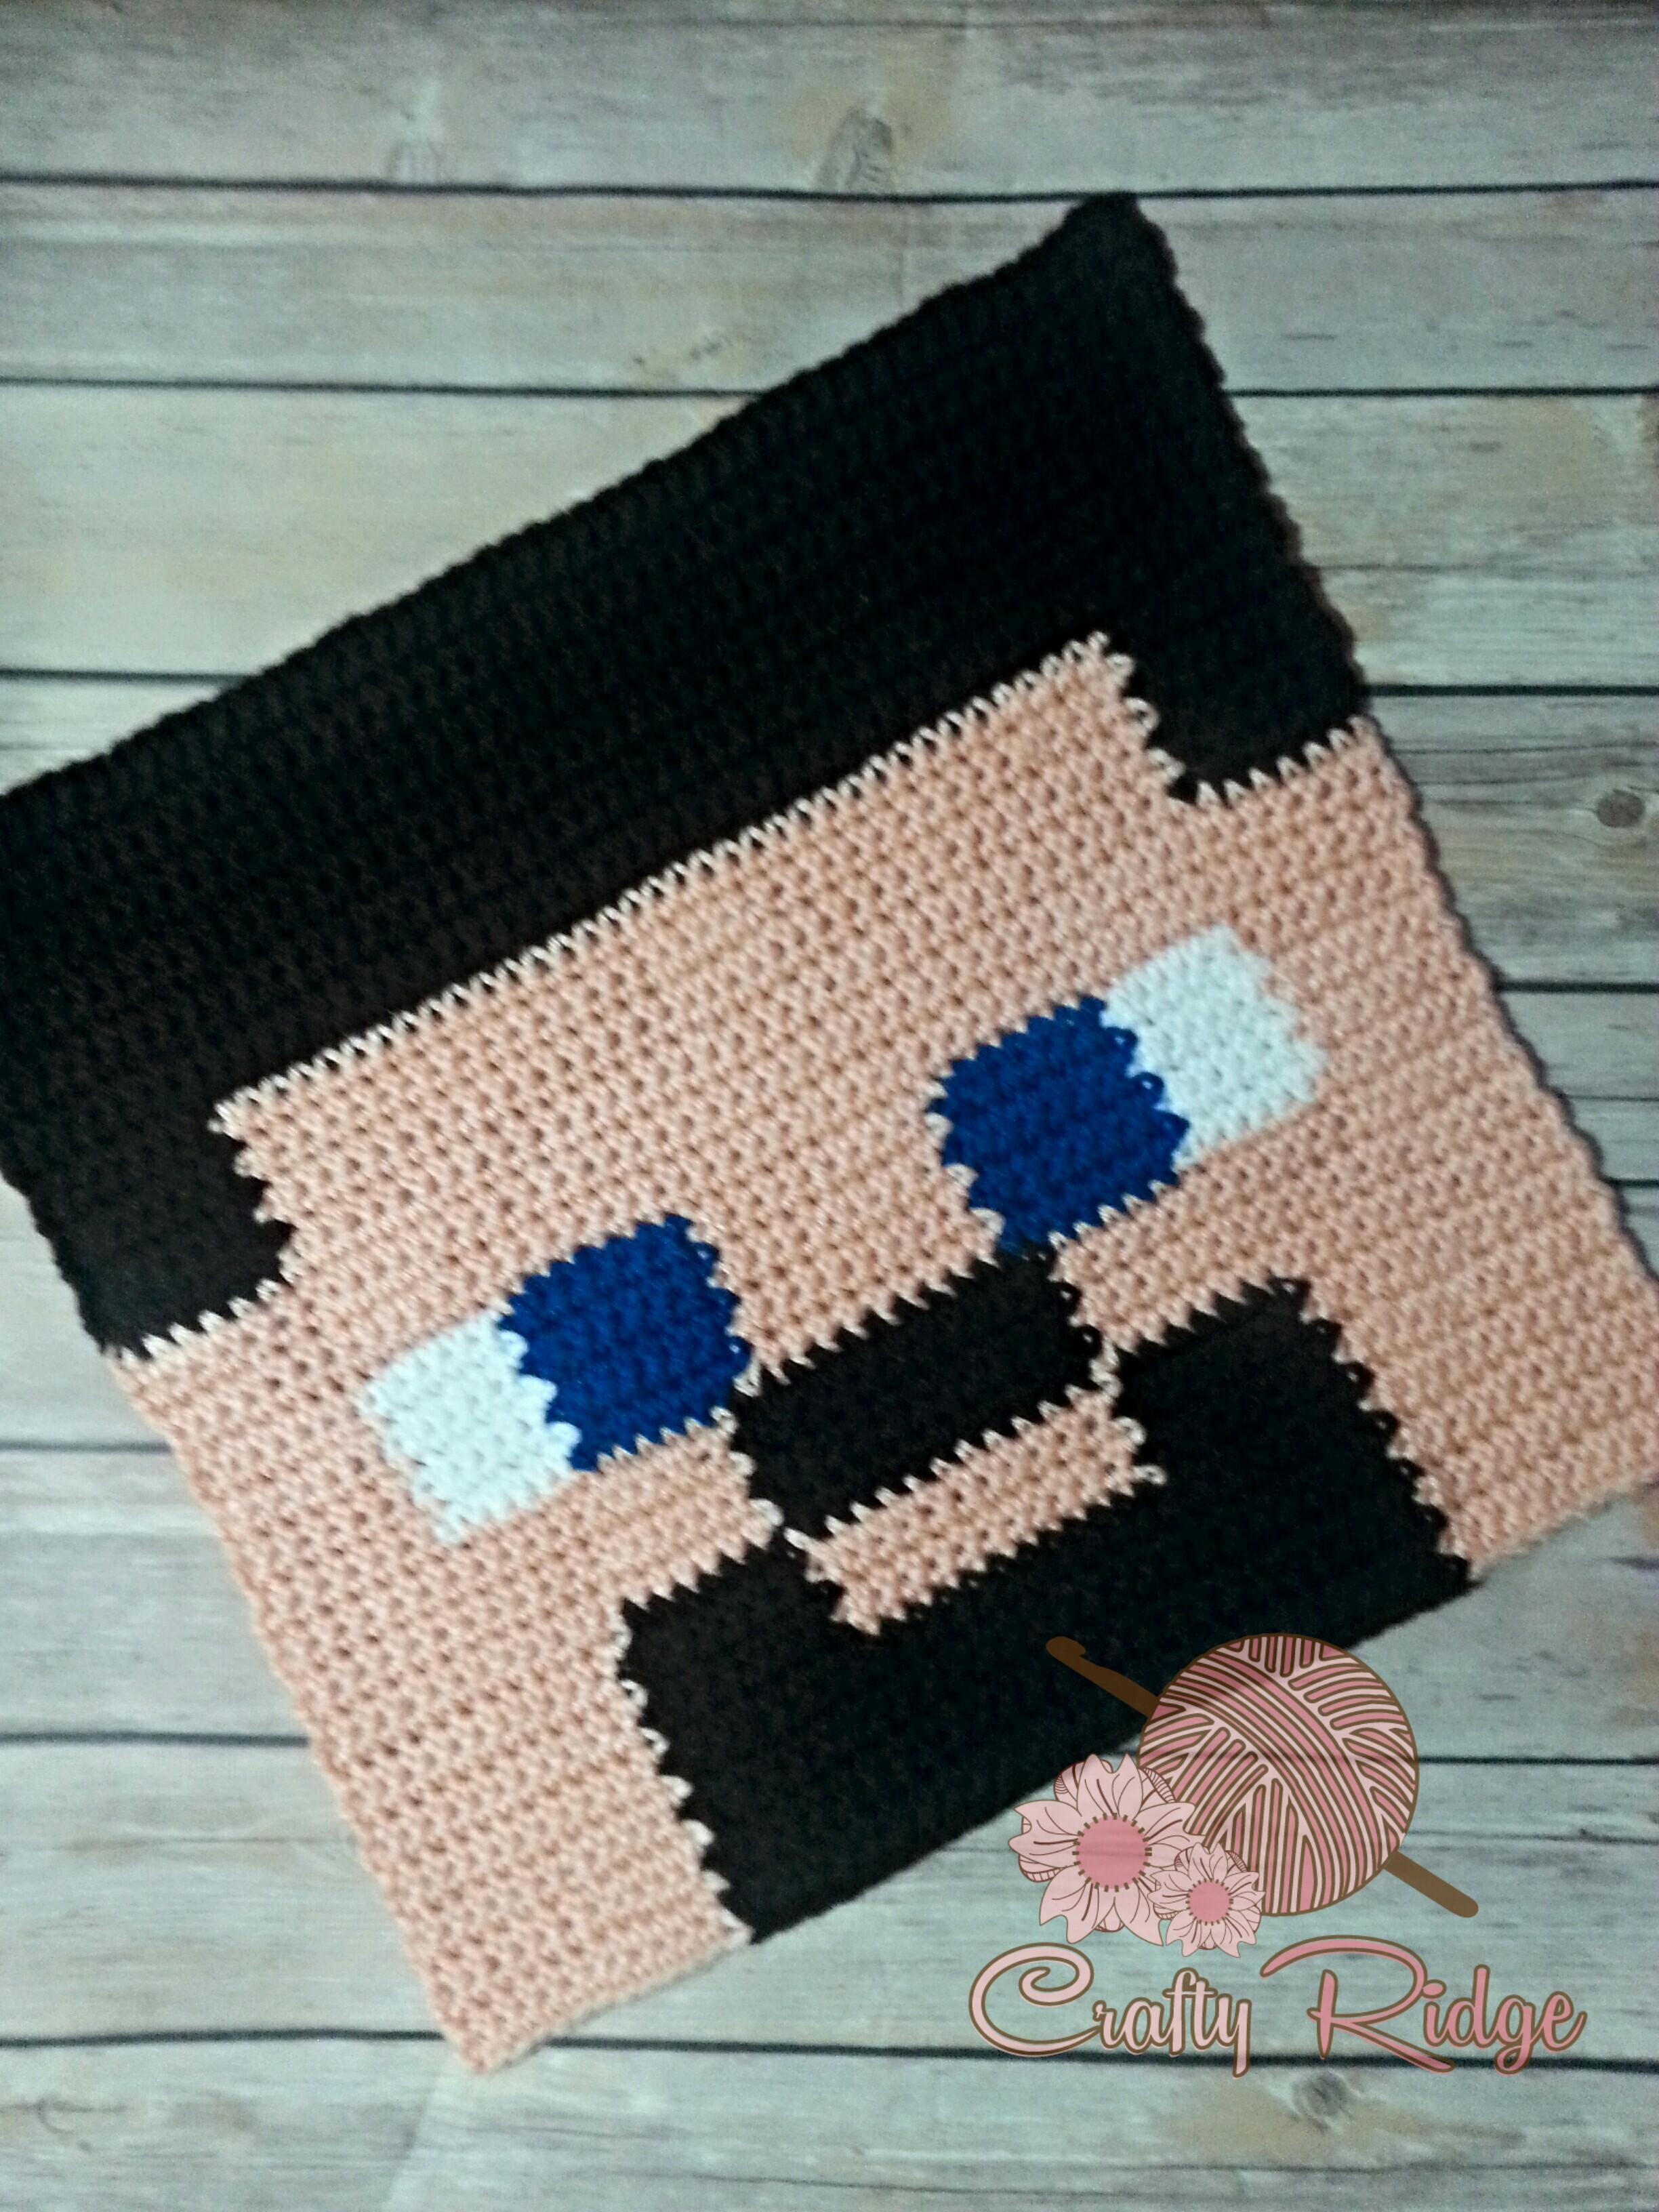 My Minecraft Obsessionits Steve Crafty Ridge Designs